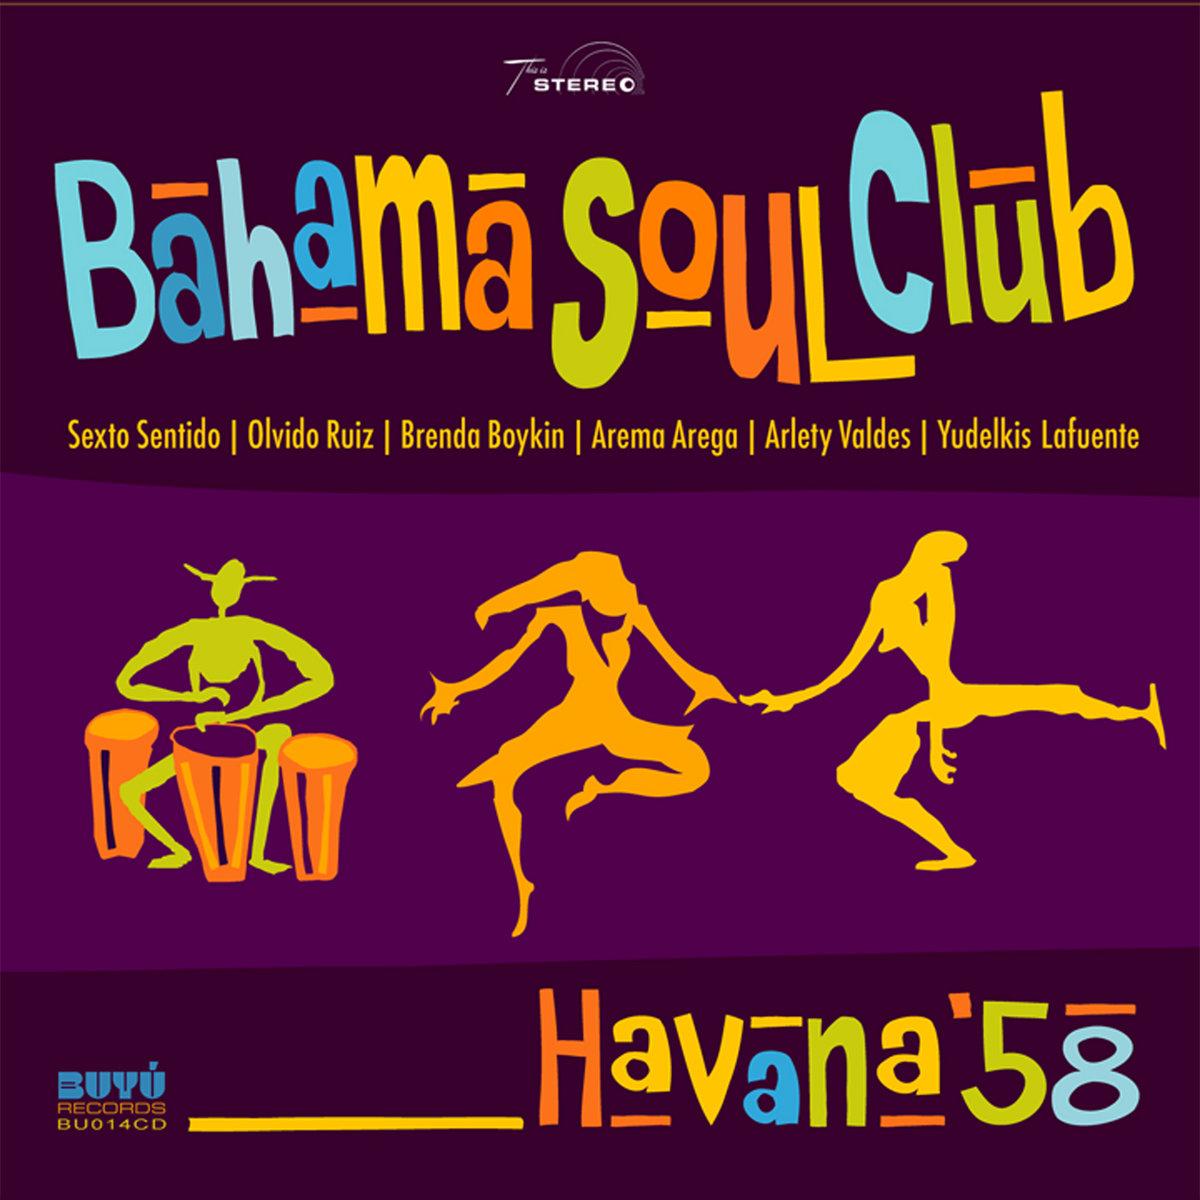 The Havana Remixes | Bahama Soul Club